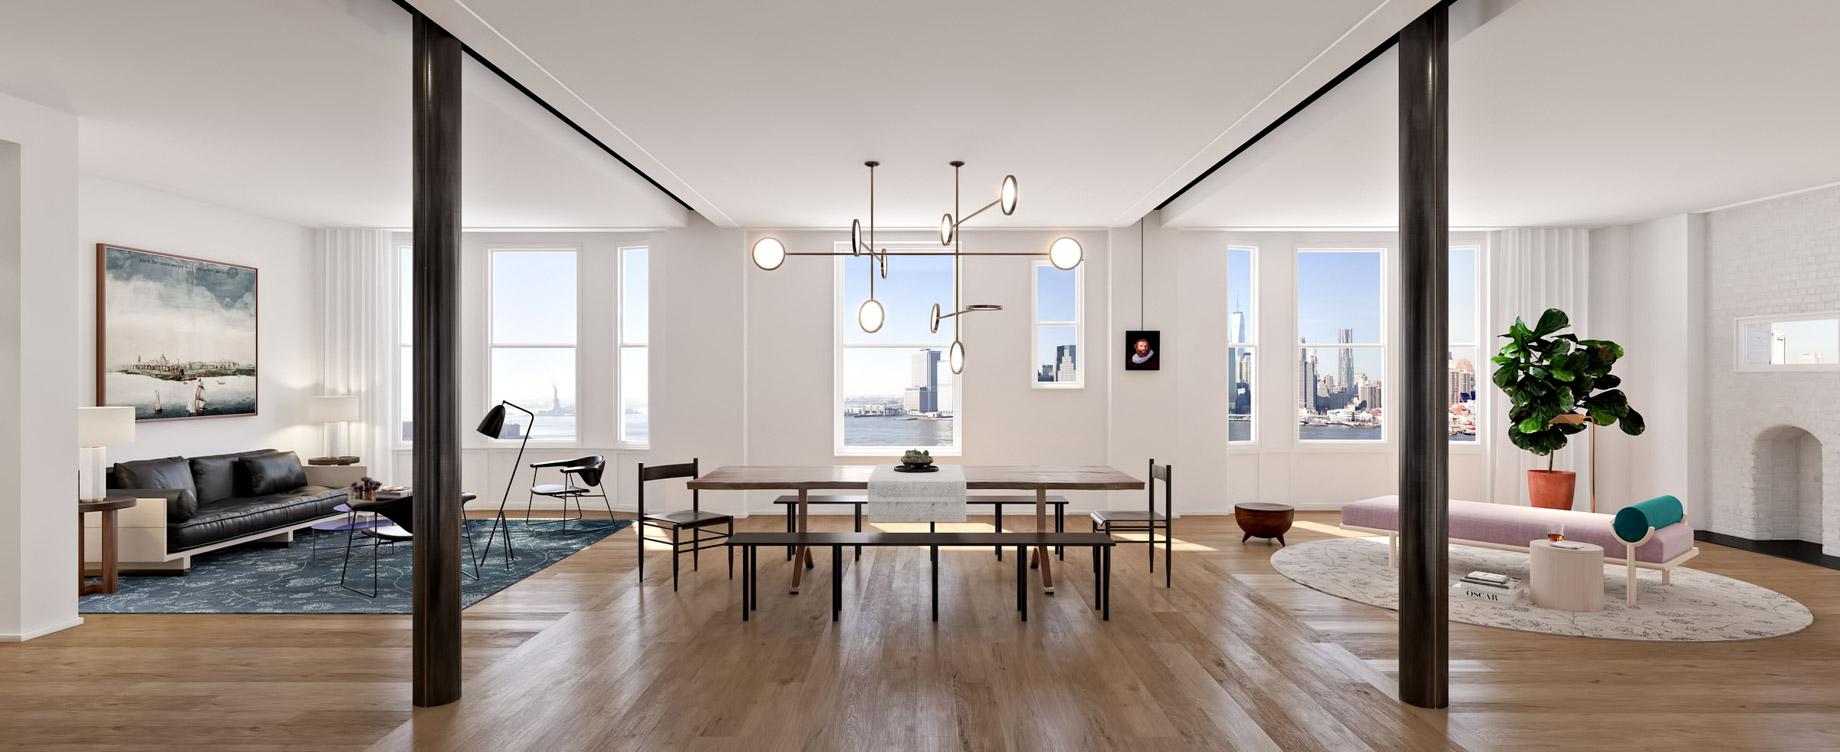 The Standish - 171 Columbia Heights, Brooklyn, NY, USA